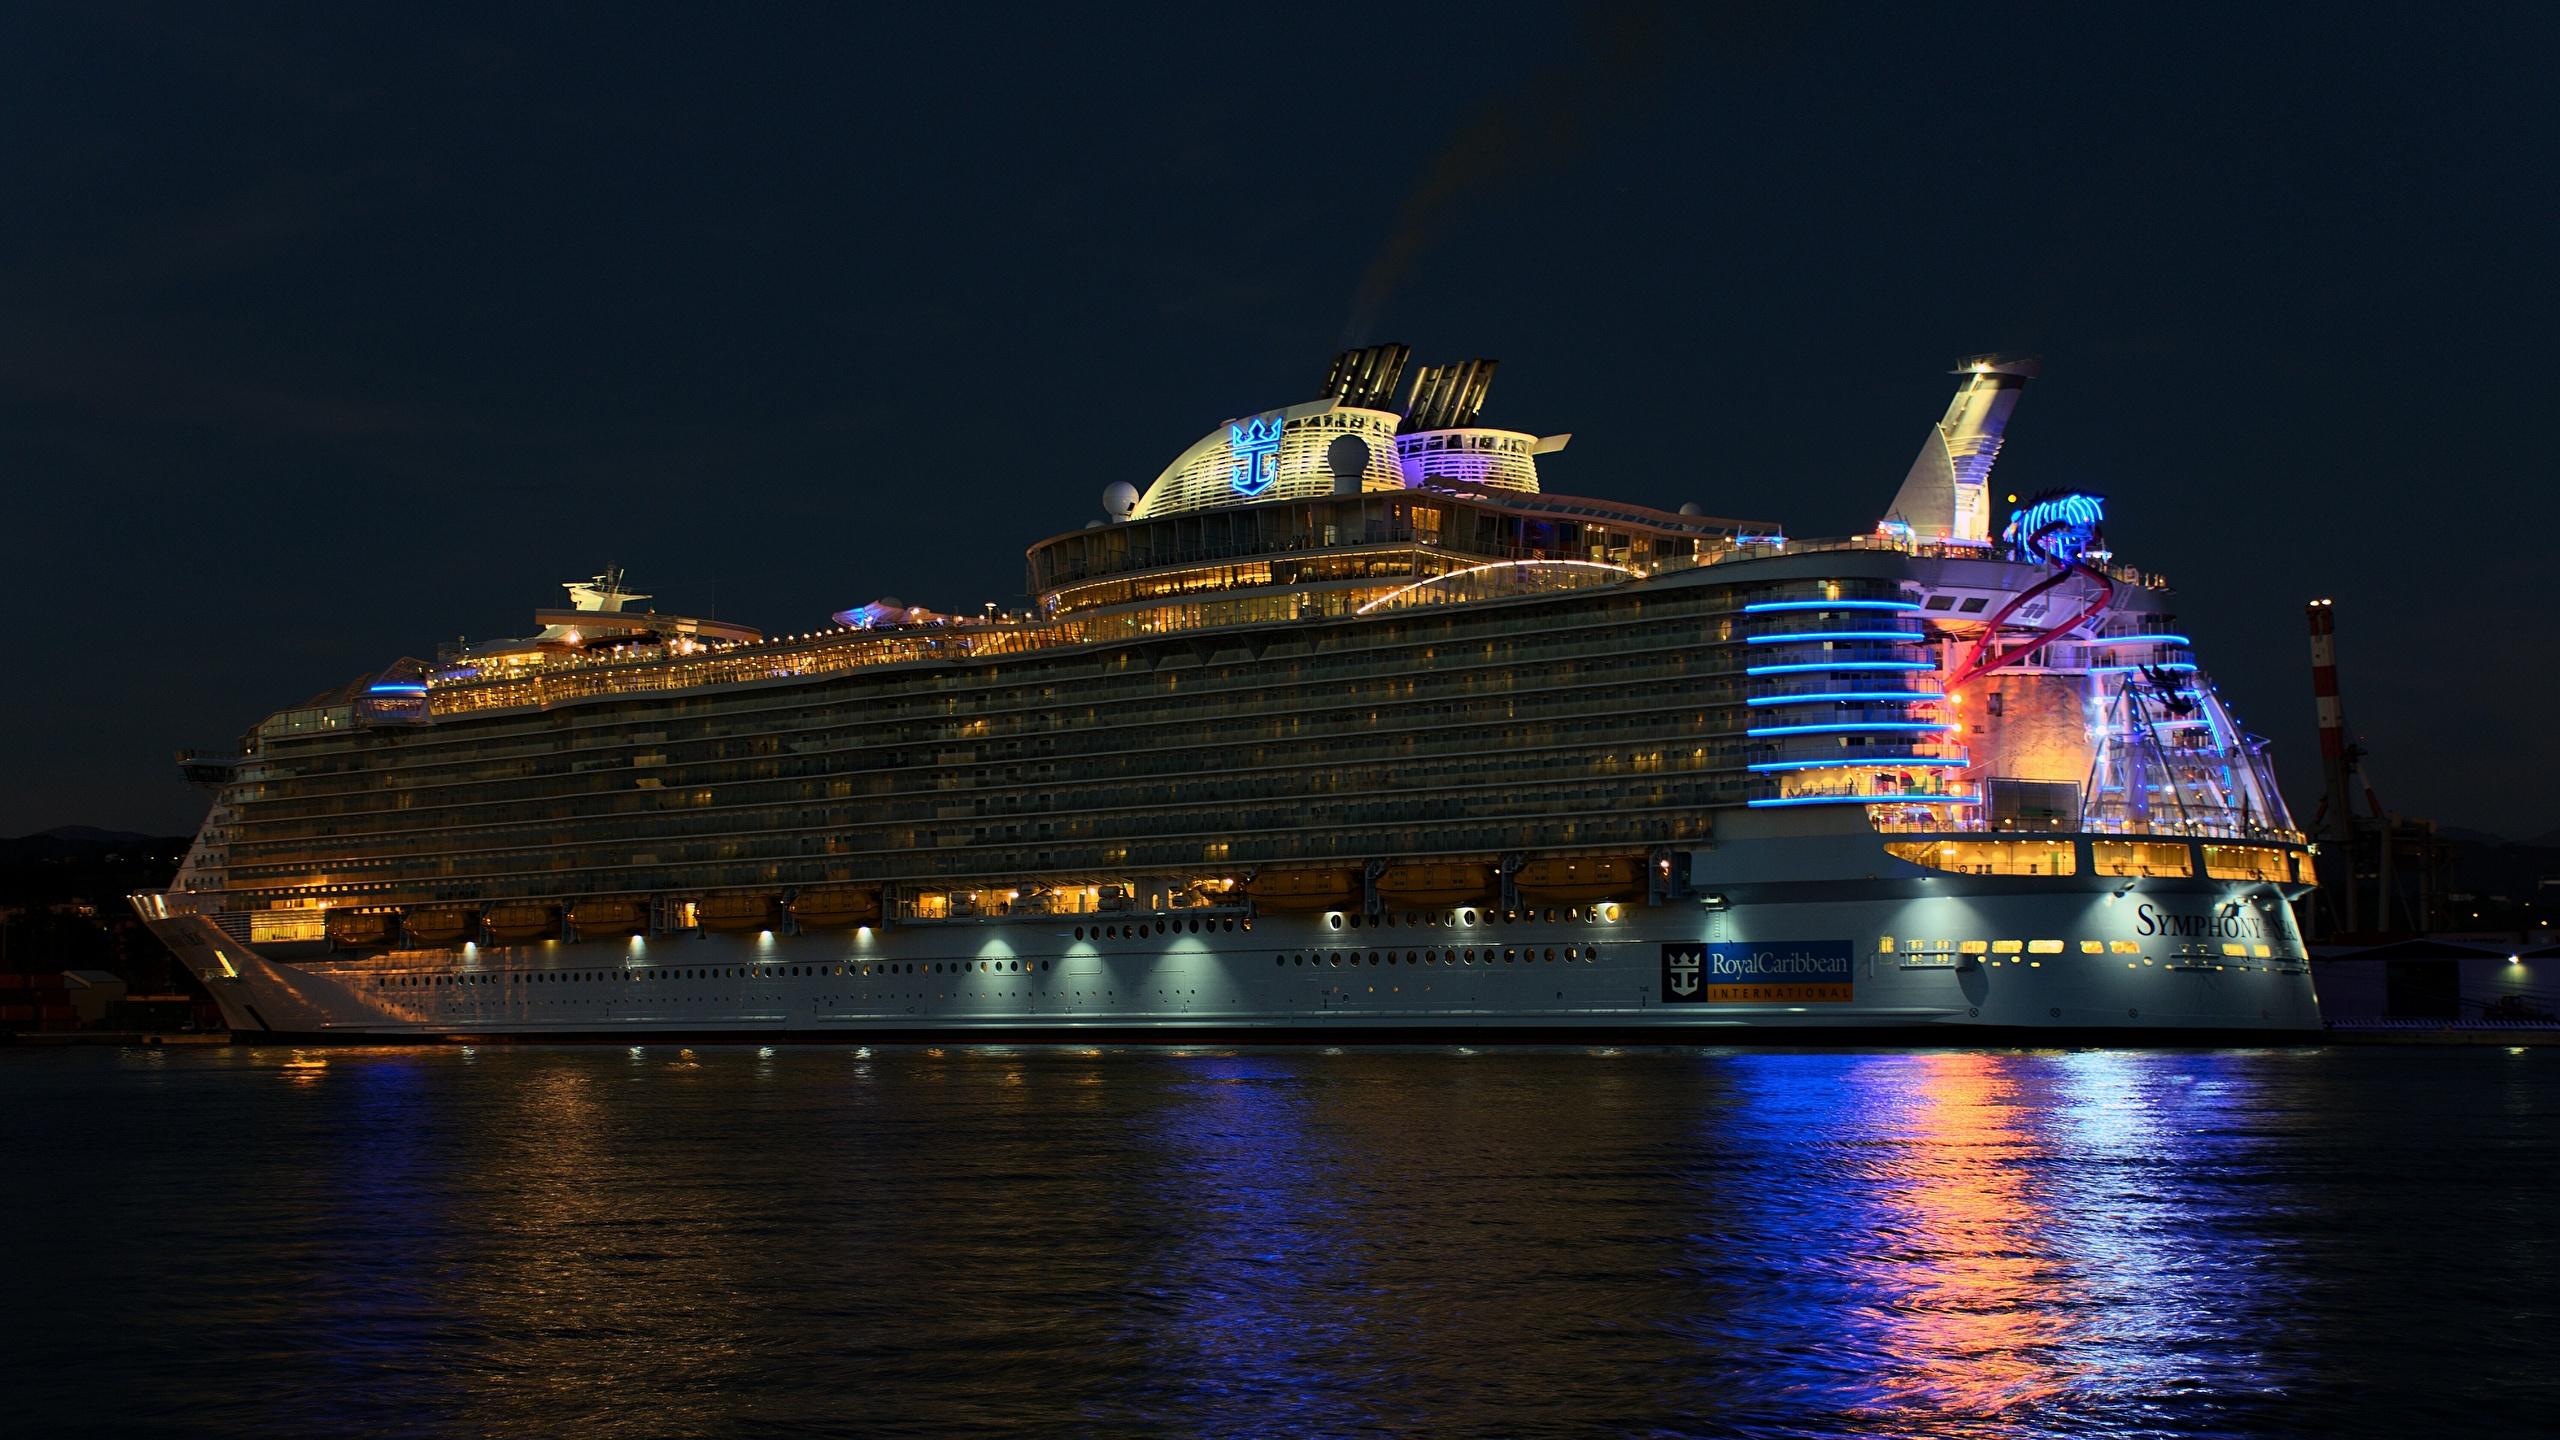 Fondos De Pantalla 2560x1440 Crucero Barco Royal Caribbean